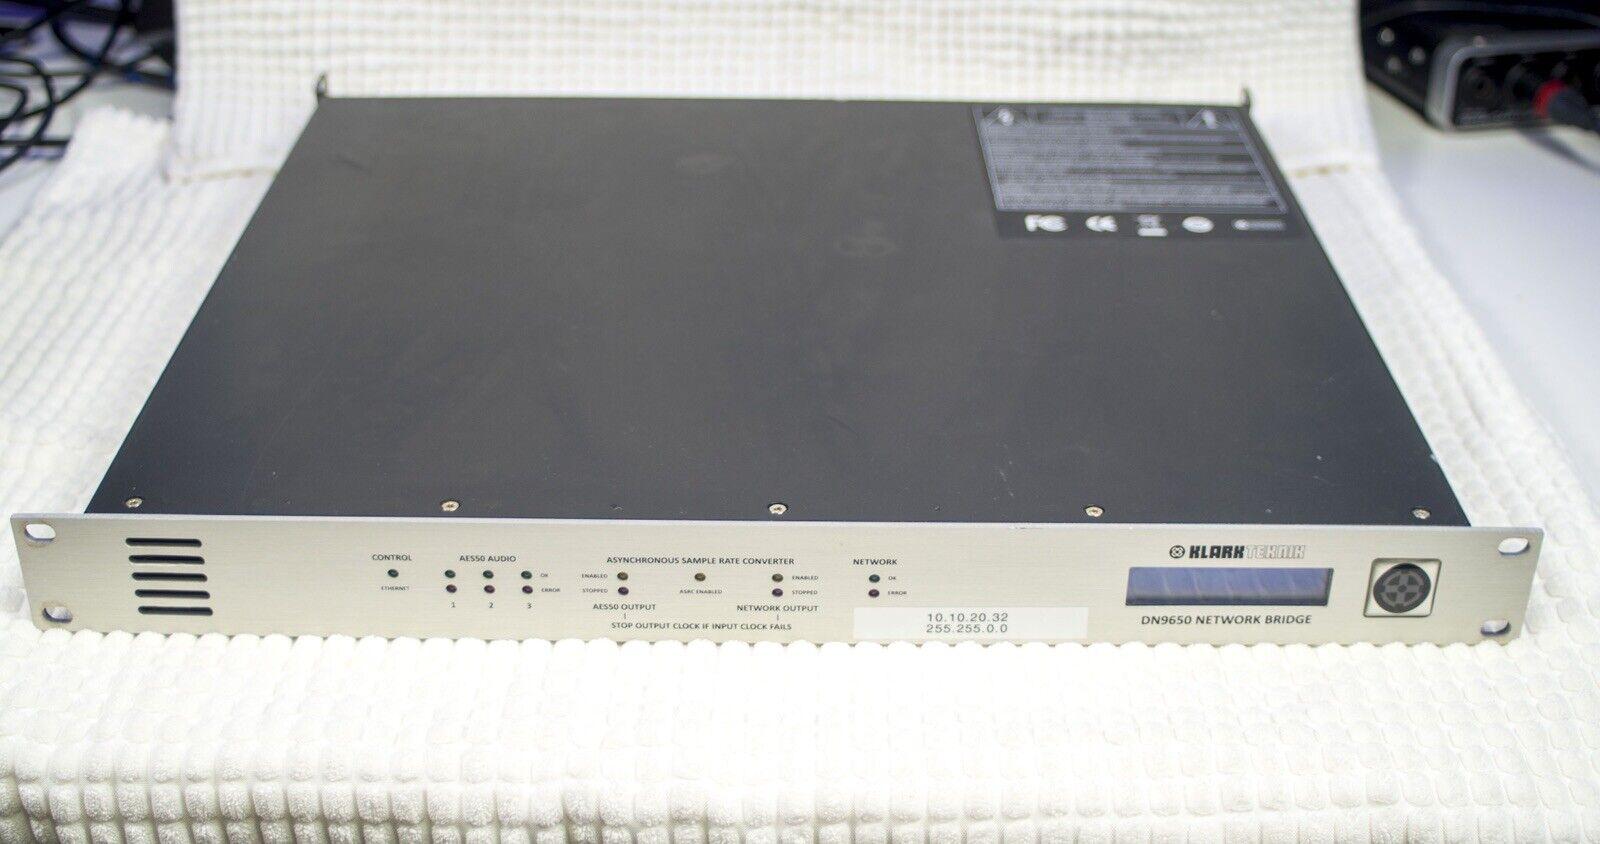 Klark Teknik DN9650 Network Bridge MADI (Used). Buy it now for 1200.00